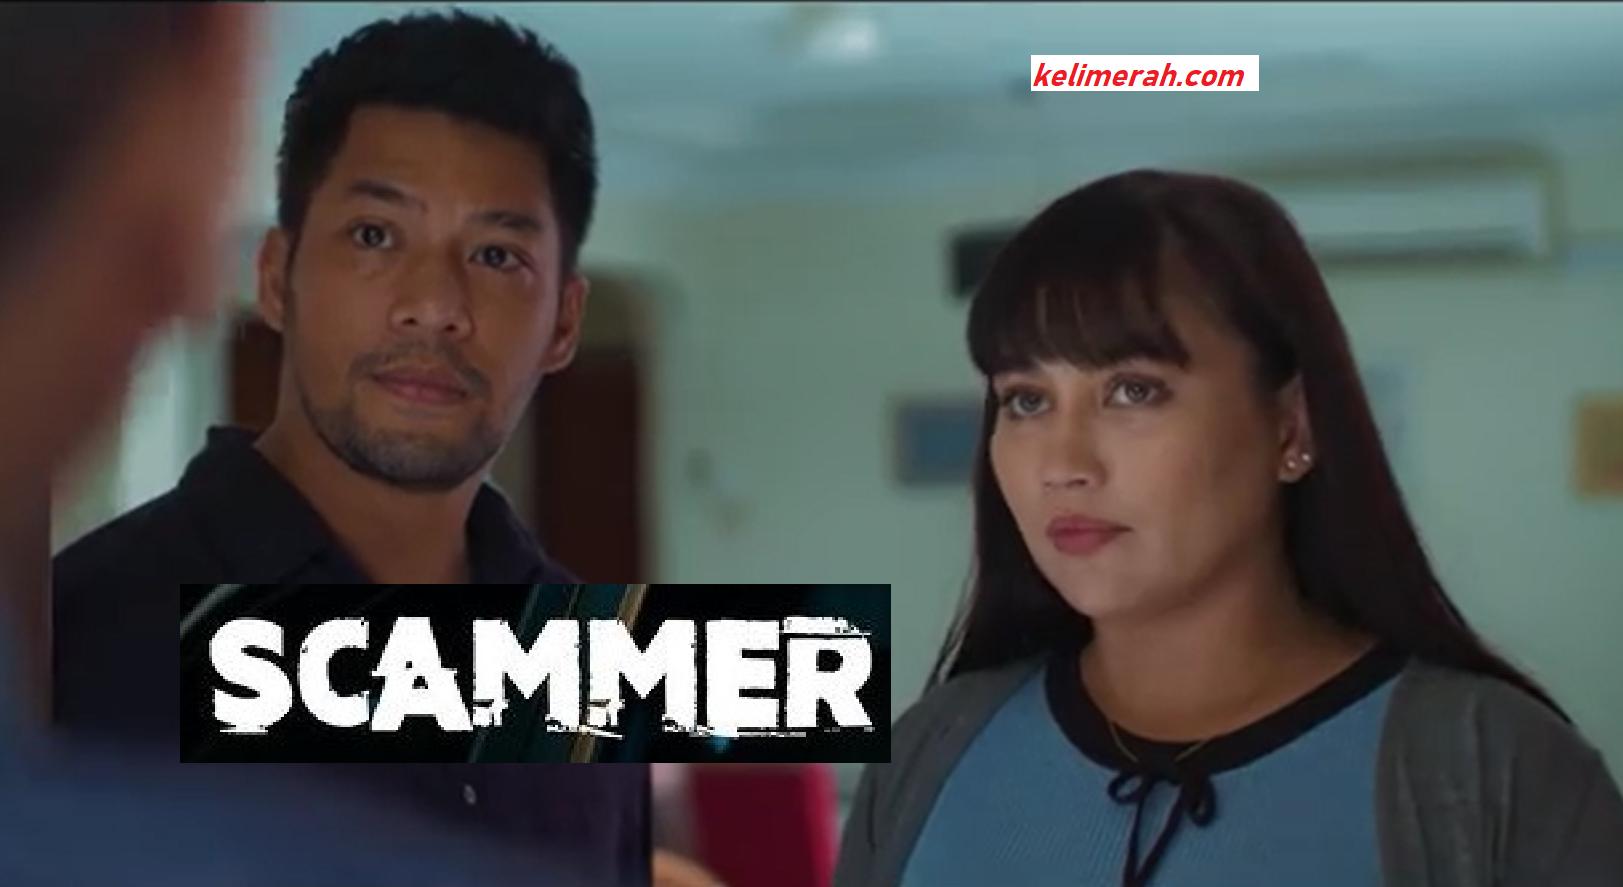 Drama Scammer Lakonan Kamal Adli,fasha Sandha